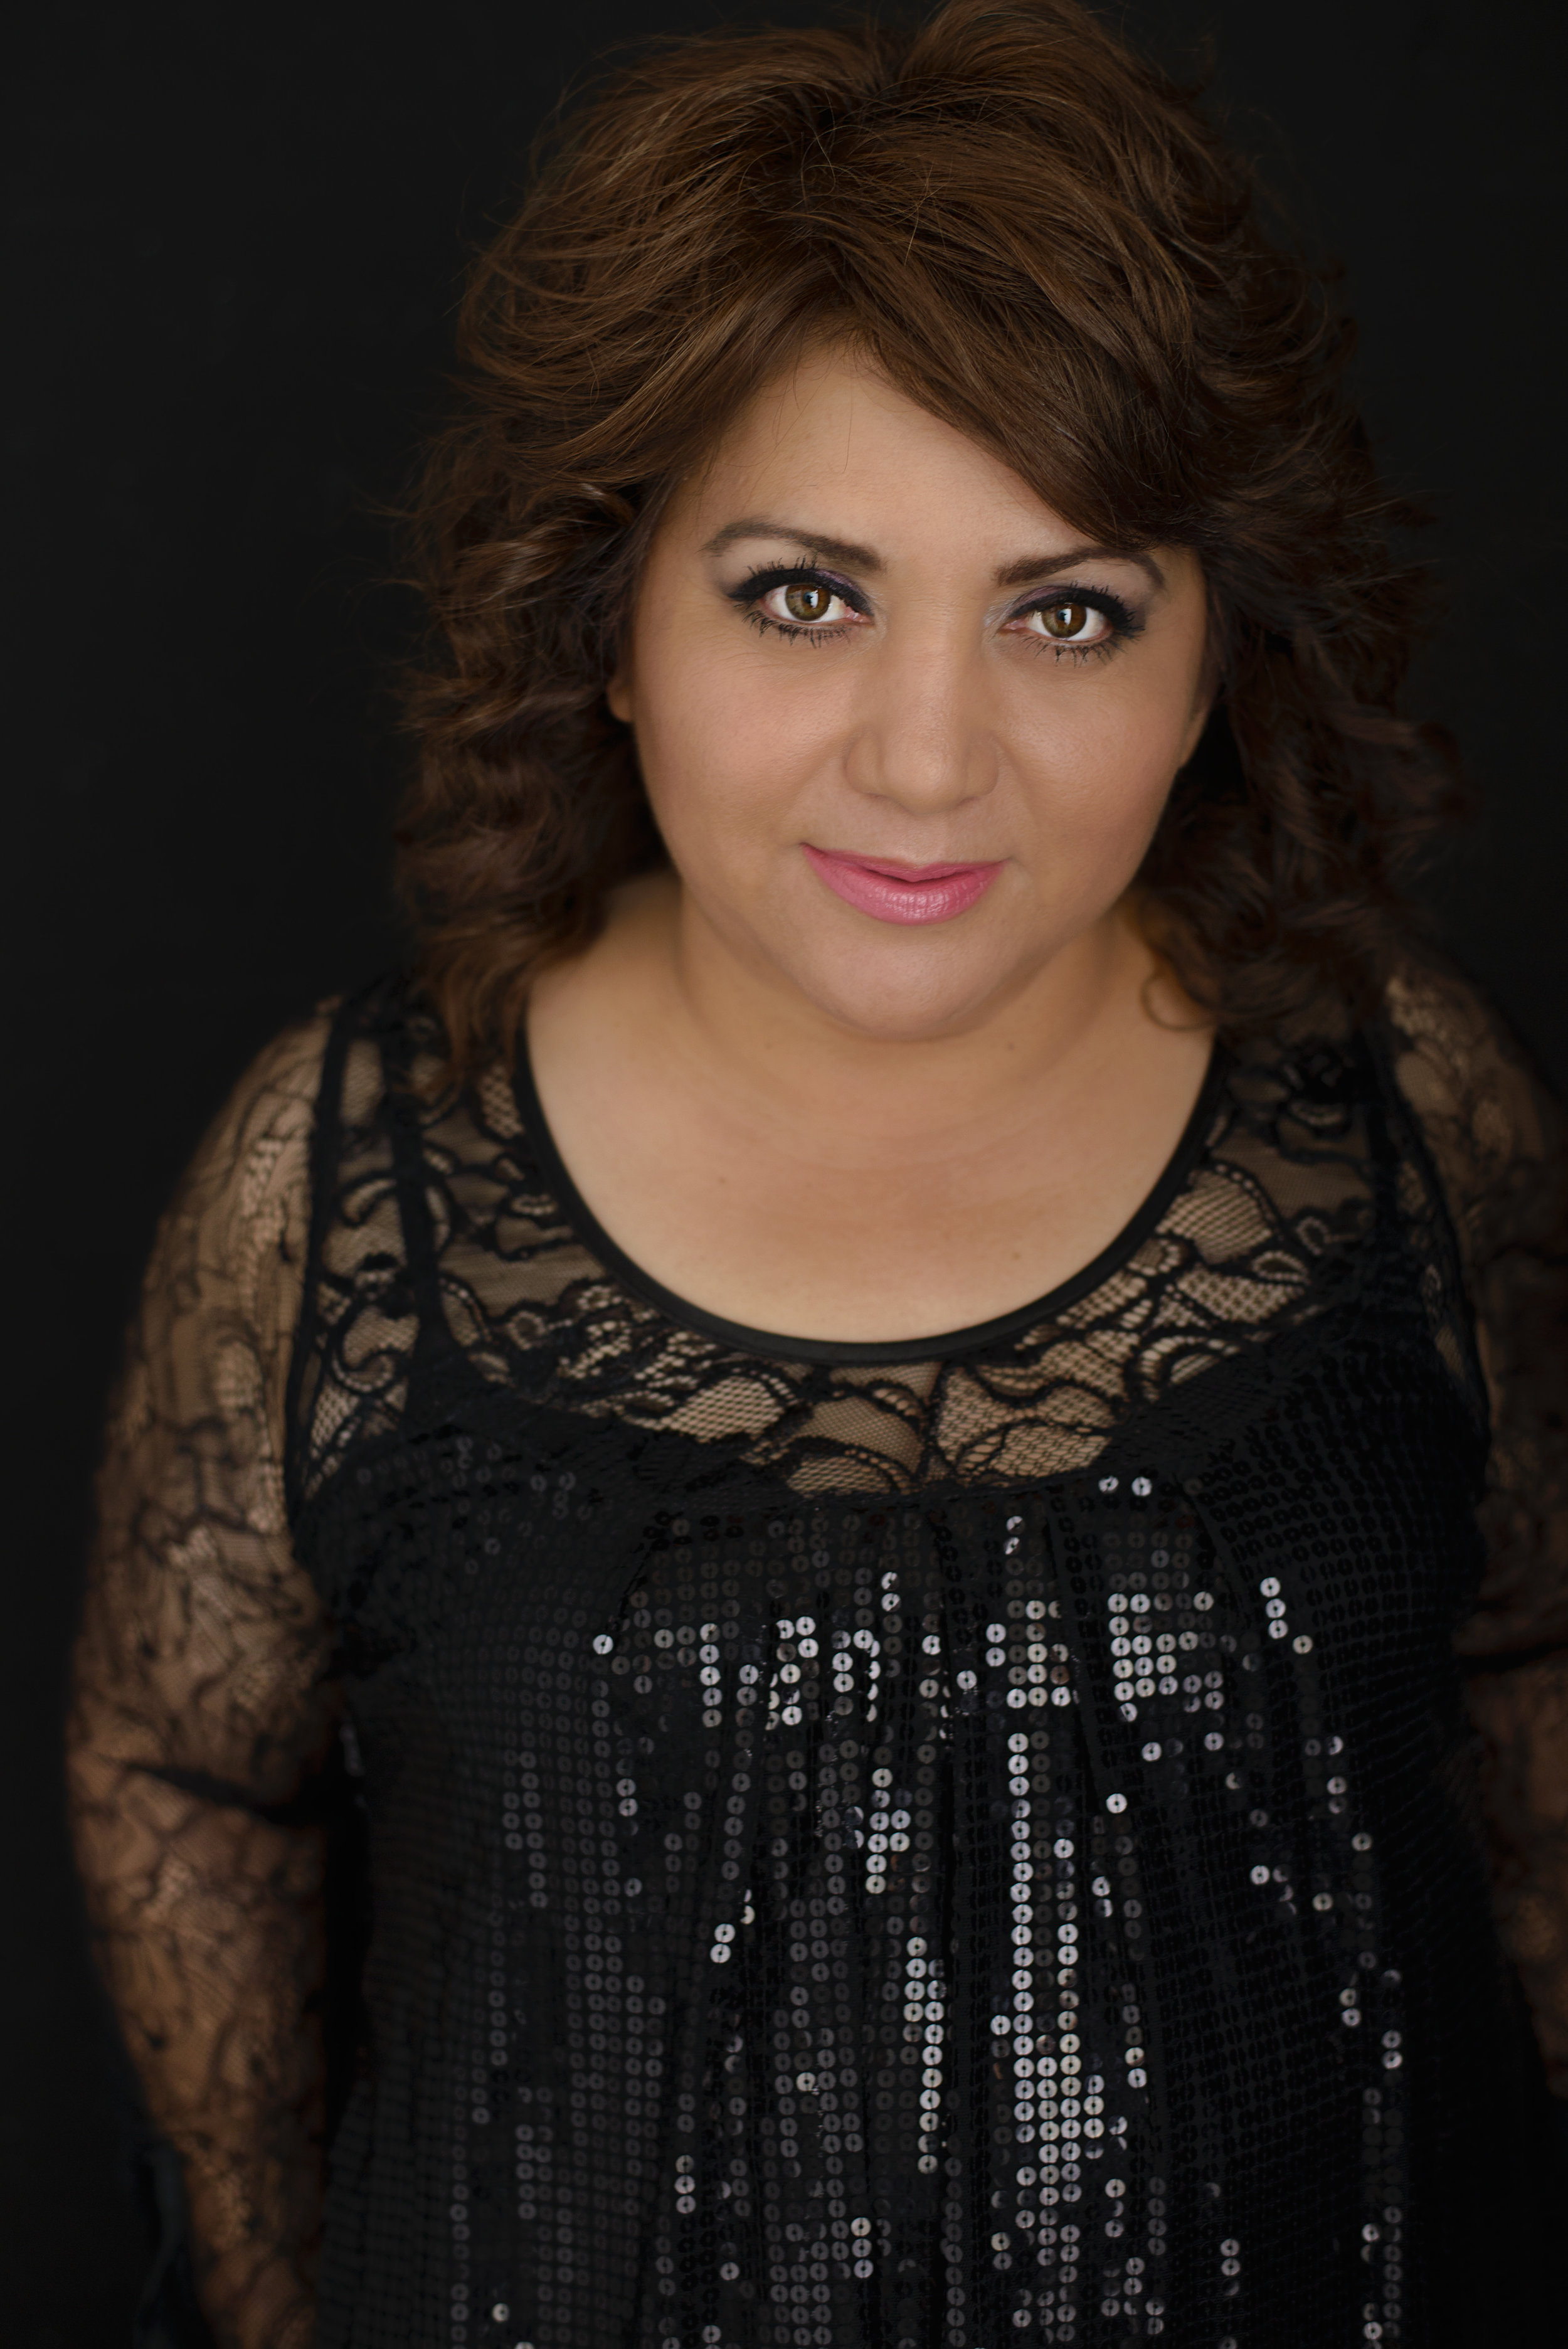 Melissa-Alcantar-Fotografia-Sesion-fotos-mexicali-retrato-brillos-texturas-18.JPG